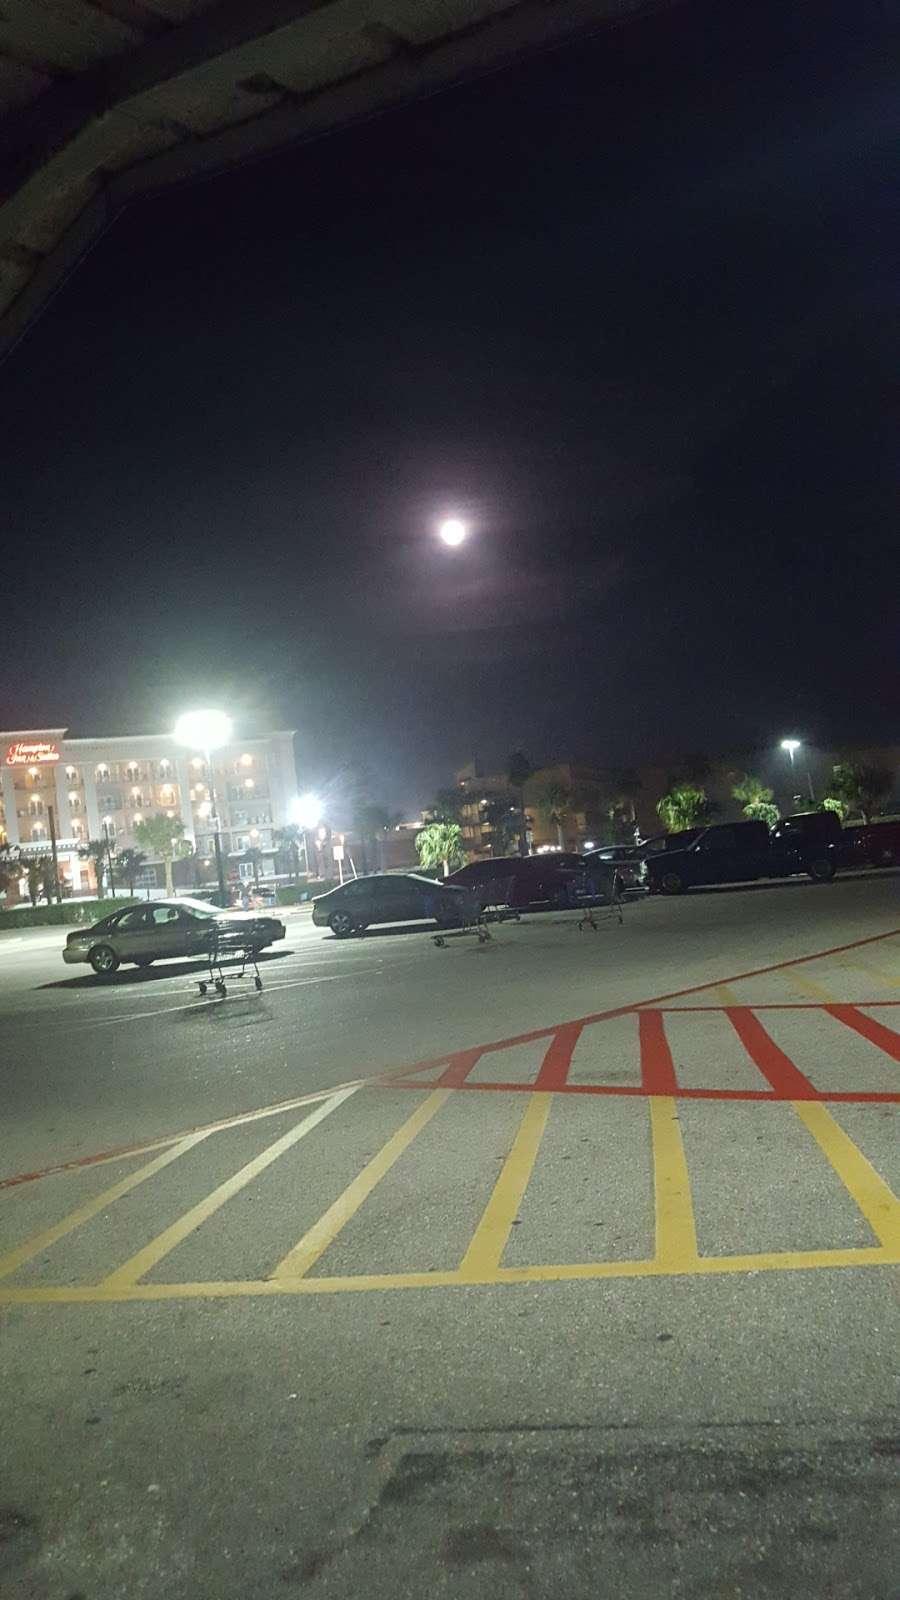 Walmart Photo Center - electronics store  | Photo 2 of 3 | Address: 6702 Seawall Blvd, Galveston, TX 77551, USA | Phone: (409) 744-2741